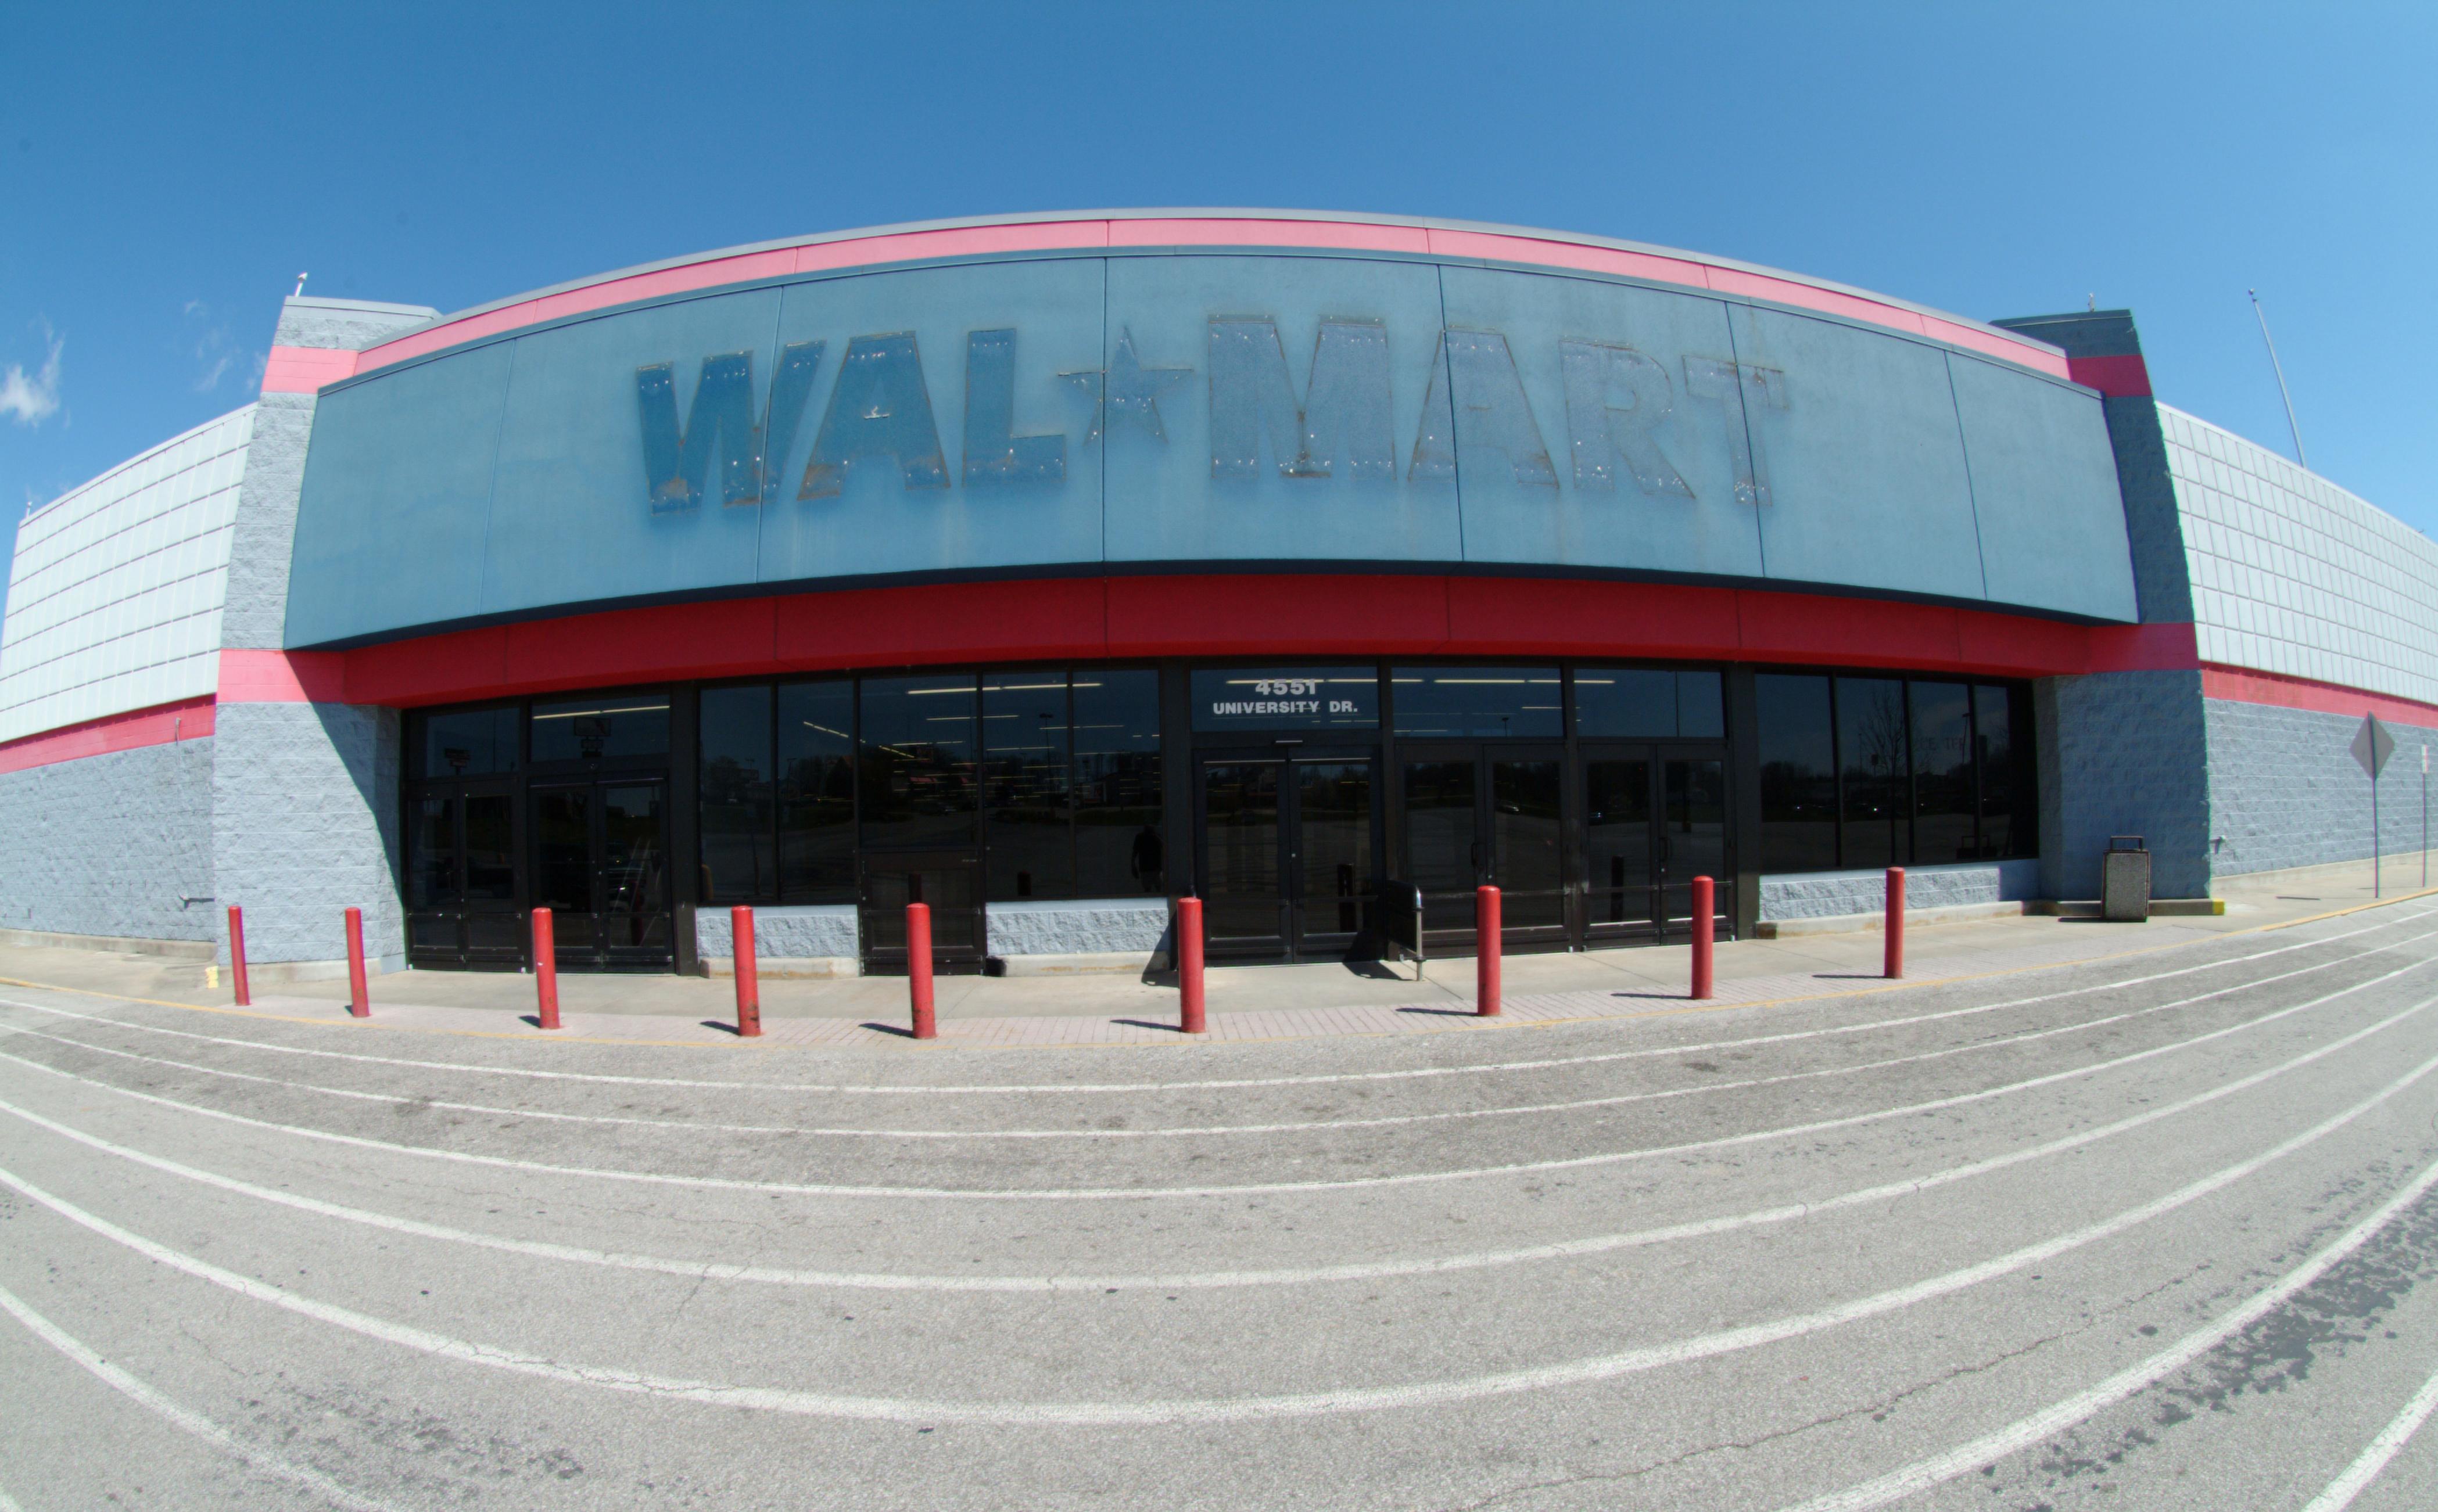 Walmart burbank opening date